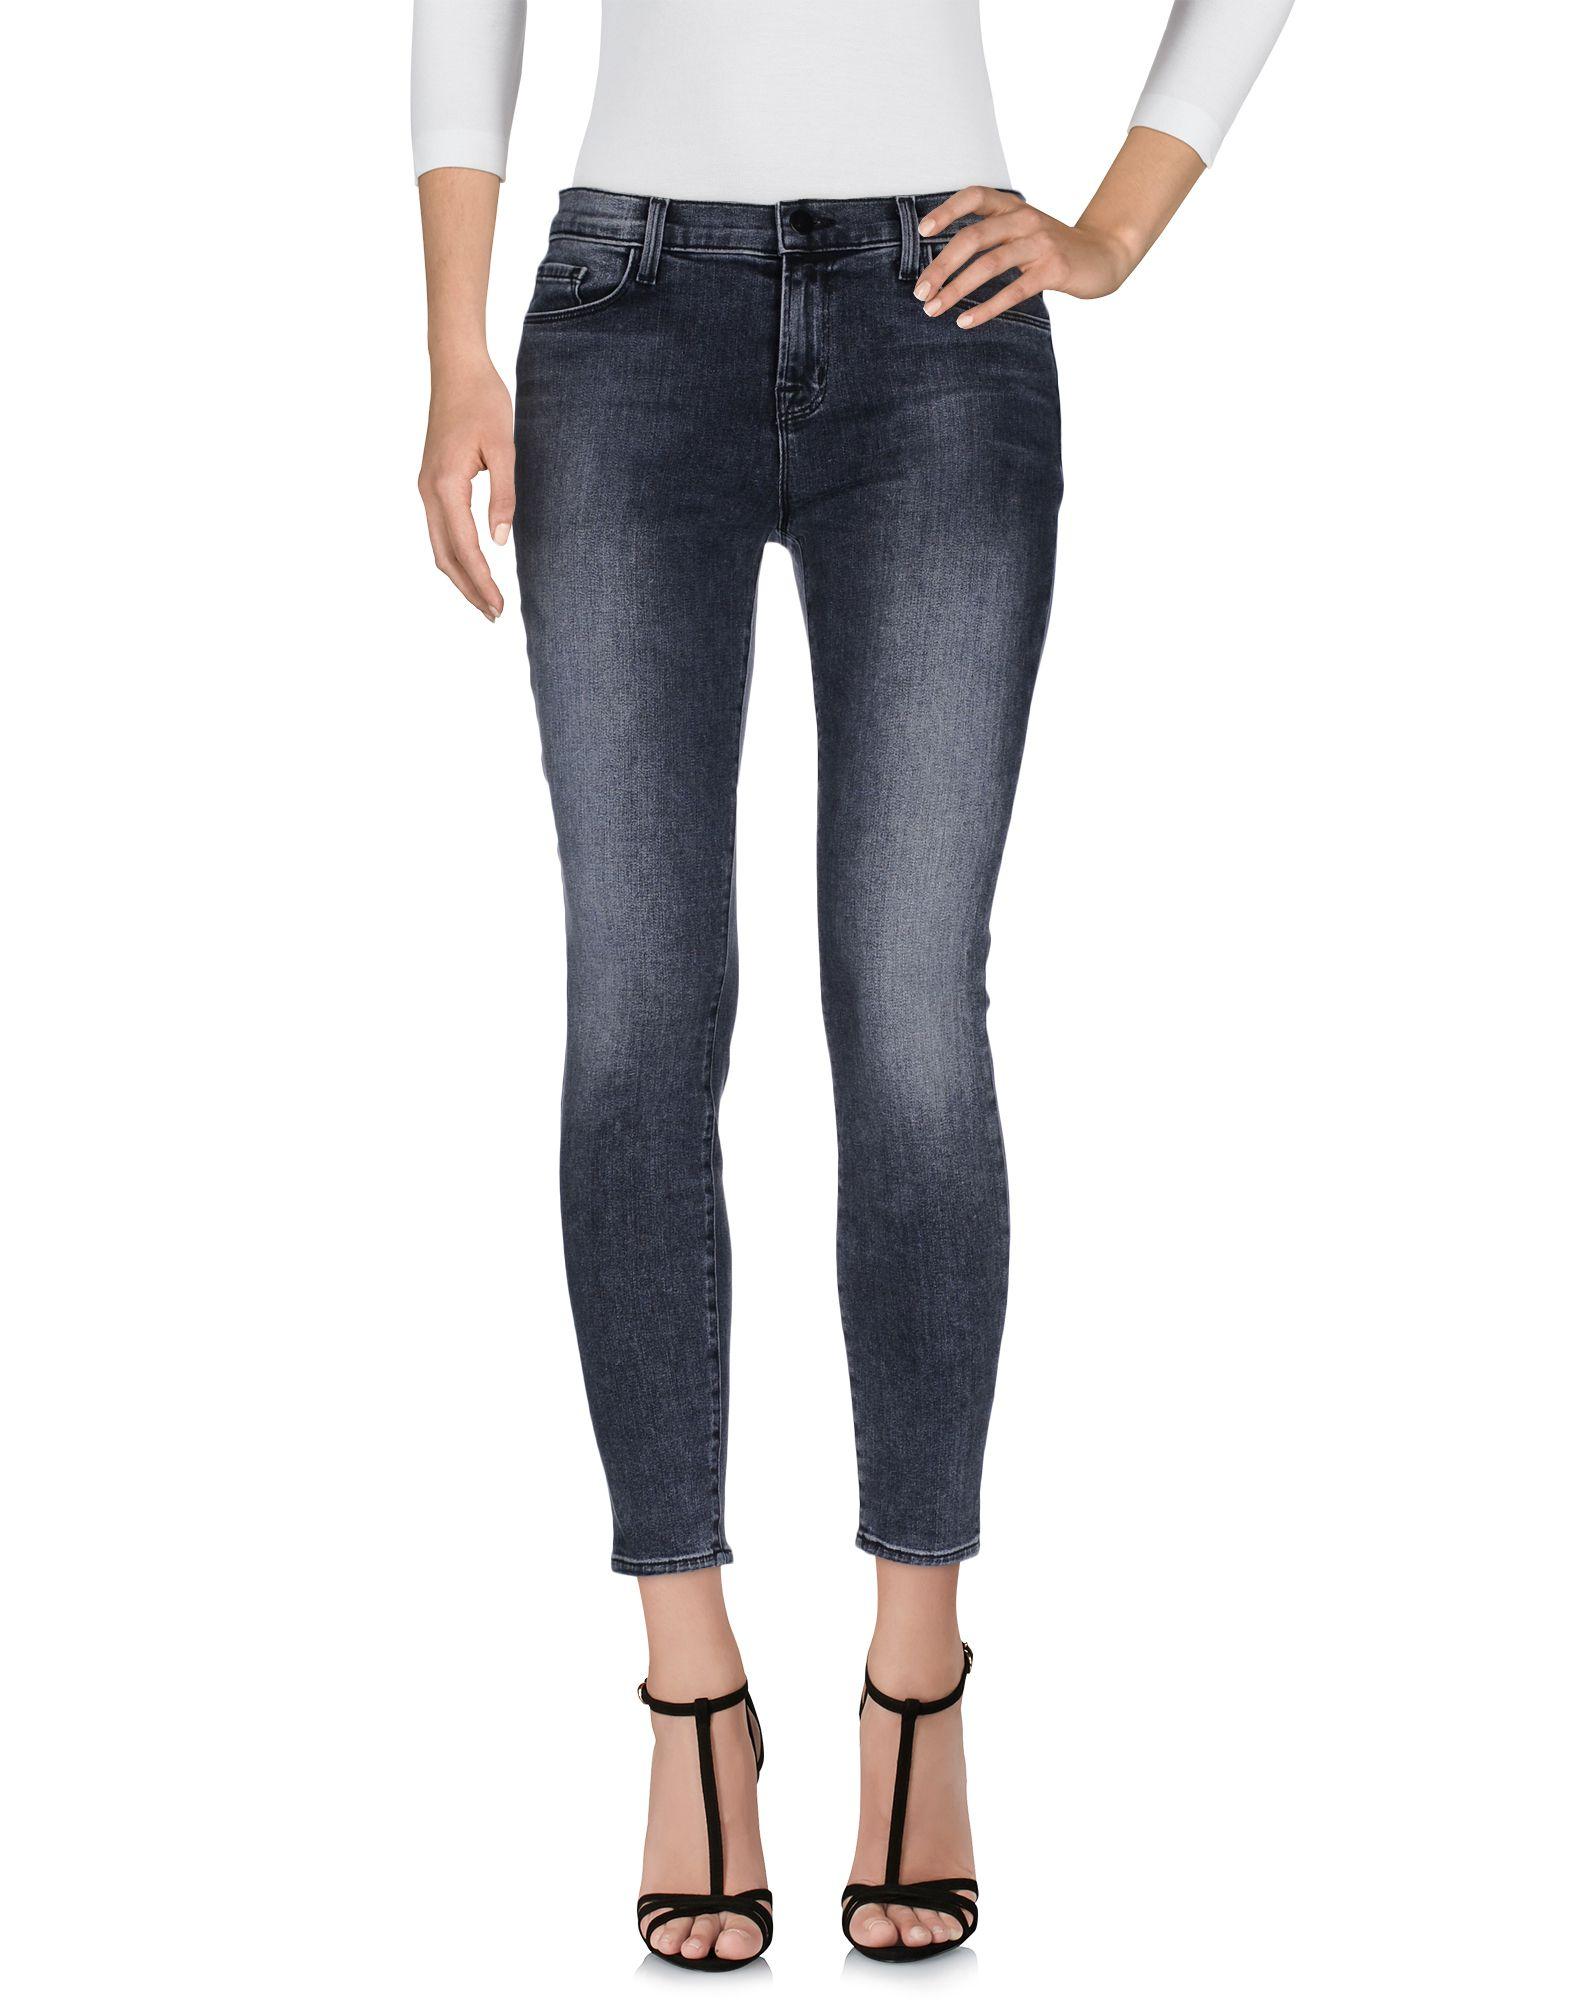 J BRAND Damen Jeanshose Farbe Blei Größe 9 jetztbilligerkaufen